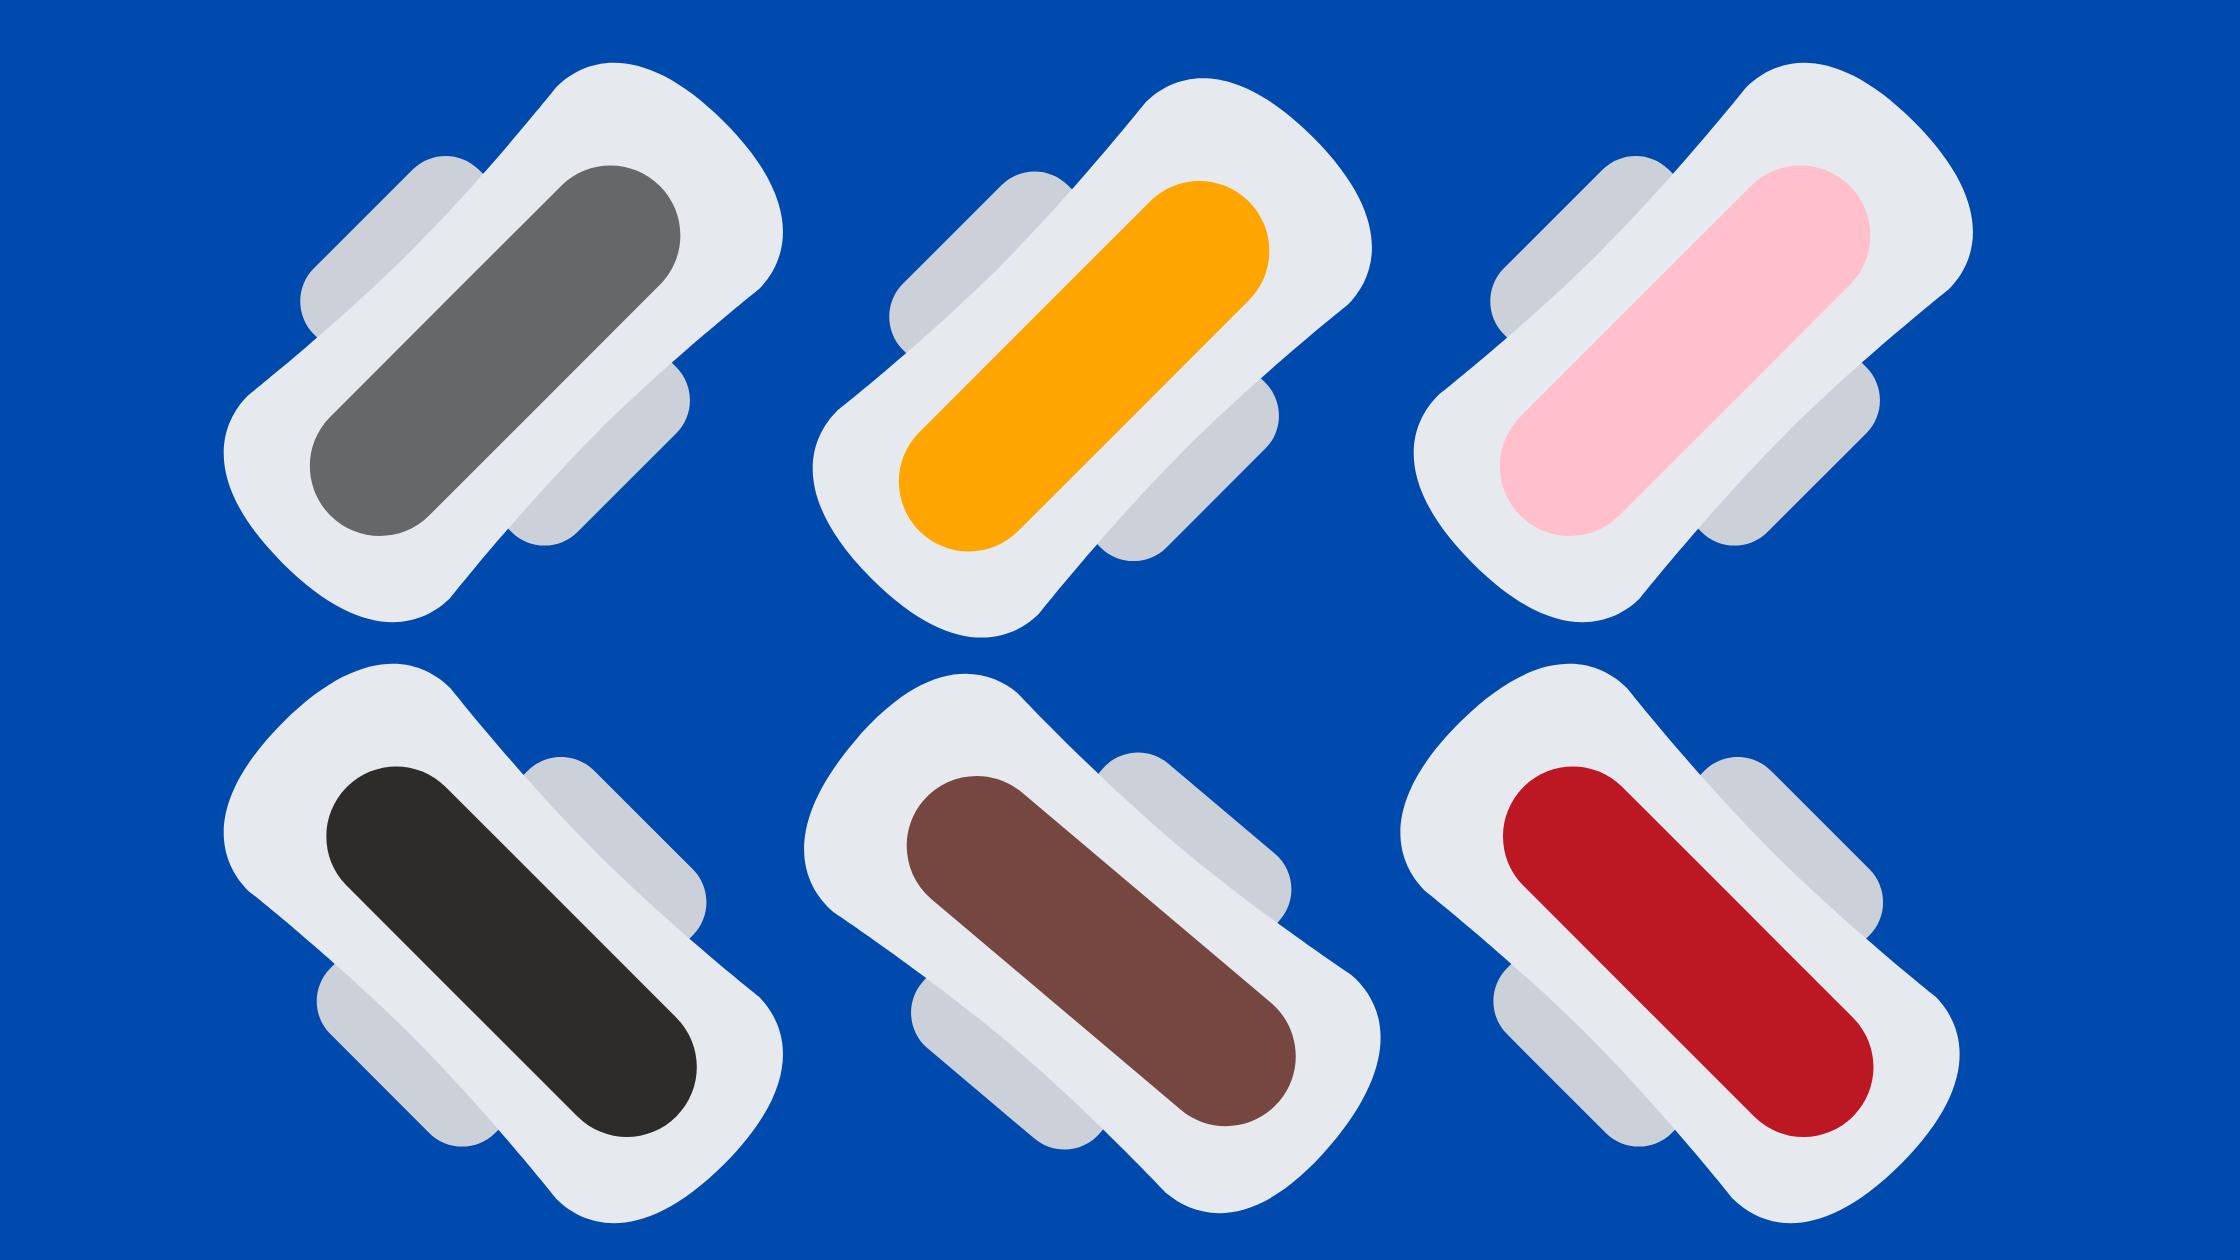 Period colors